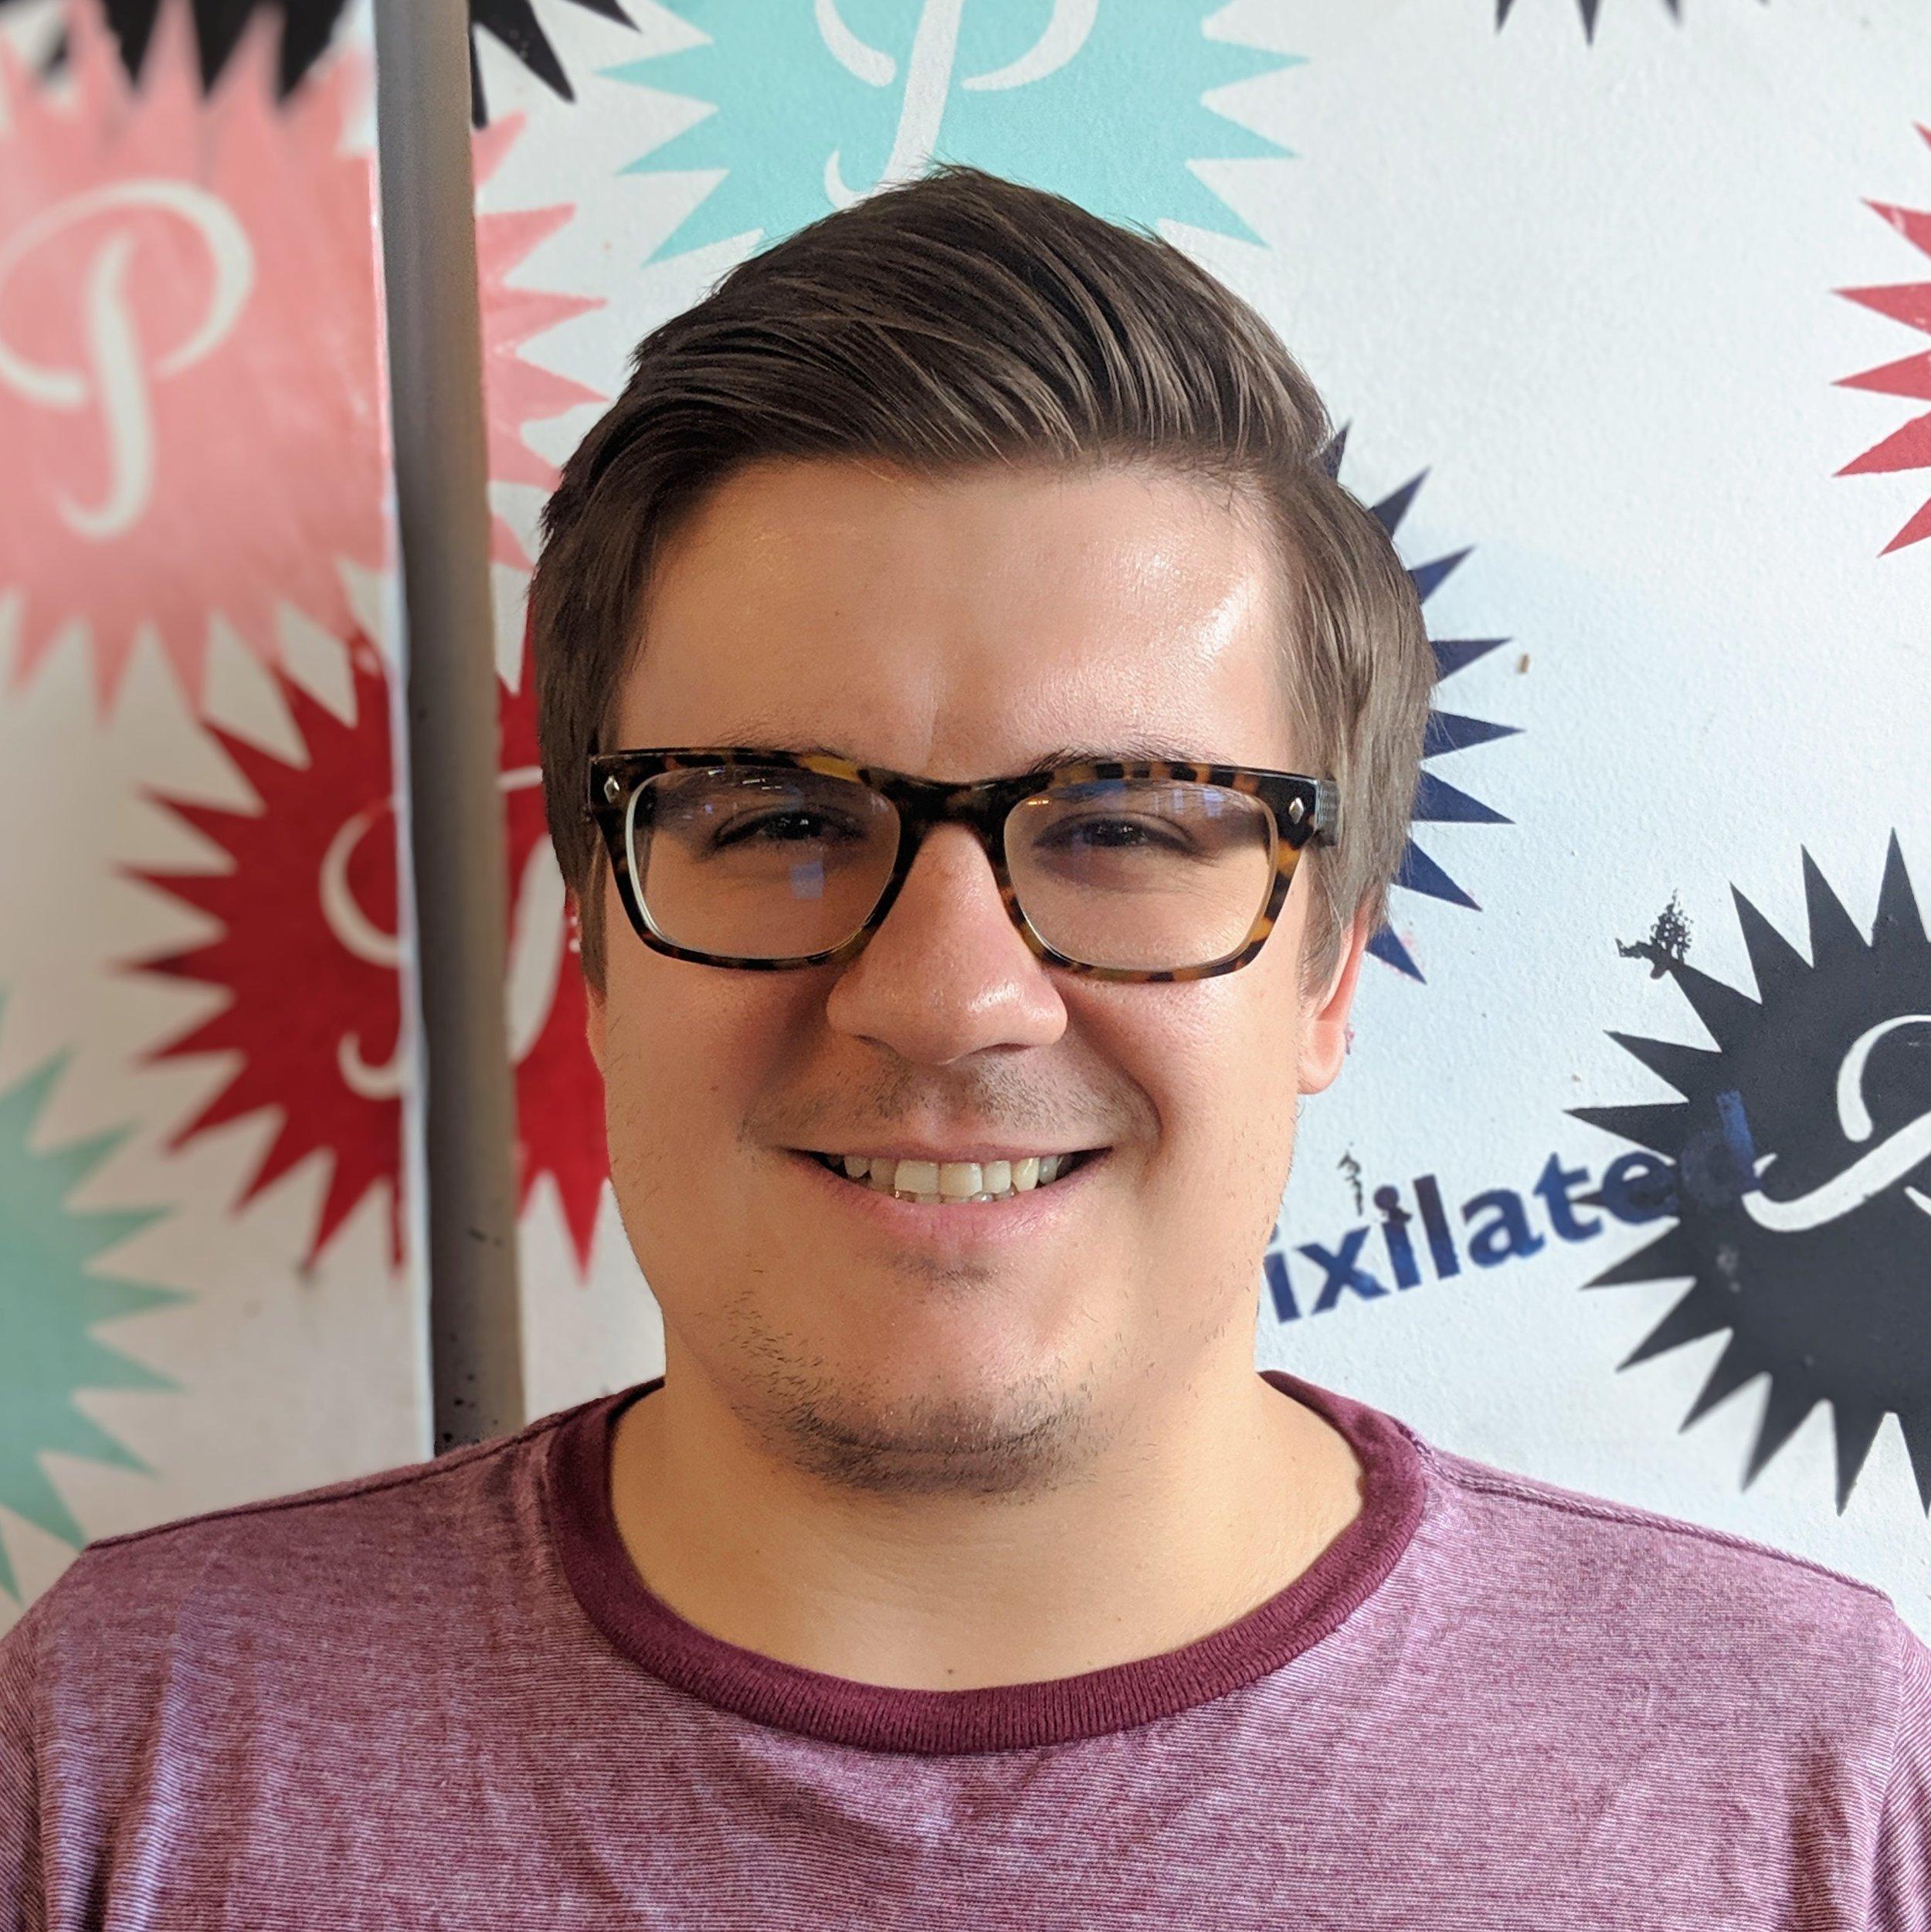 Alex McGlynn Pixilated VP of Growth